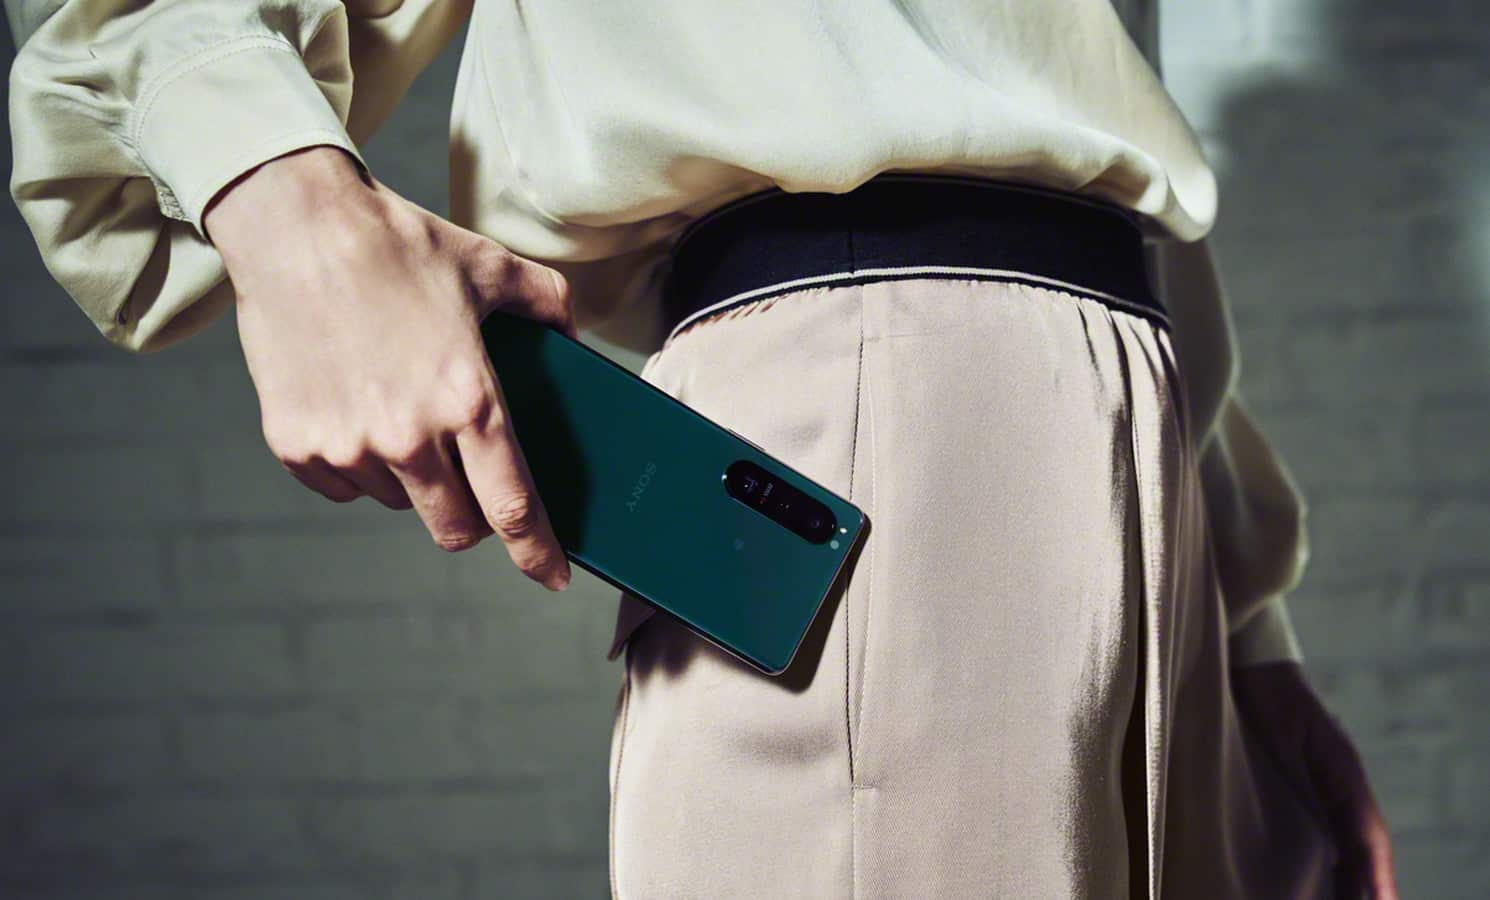 Sony Xperia 5 III image 1